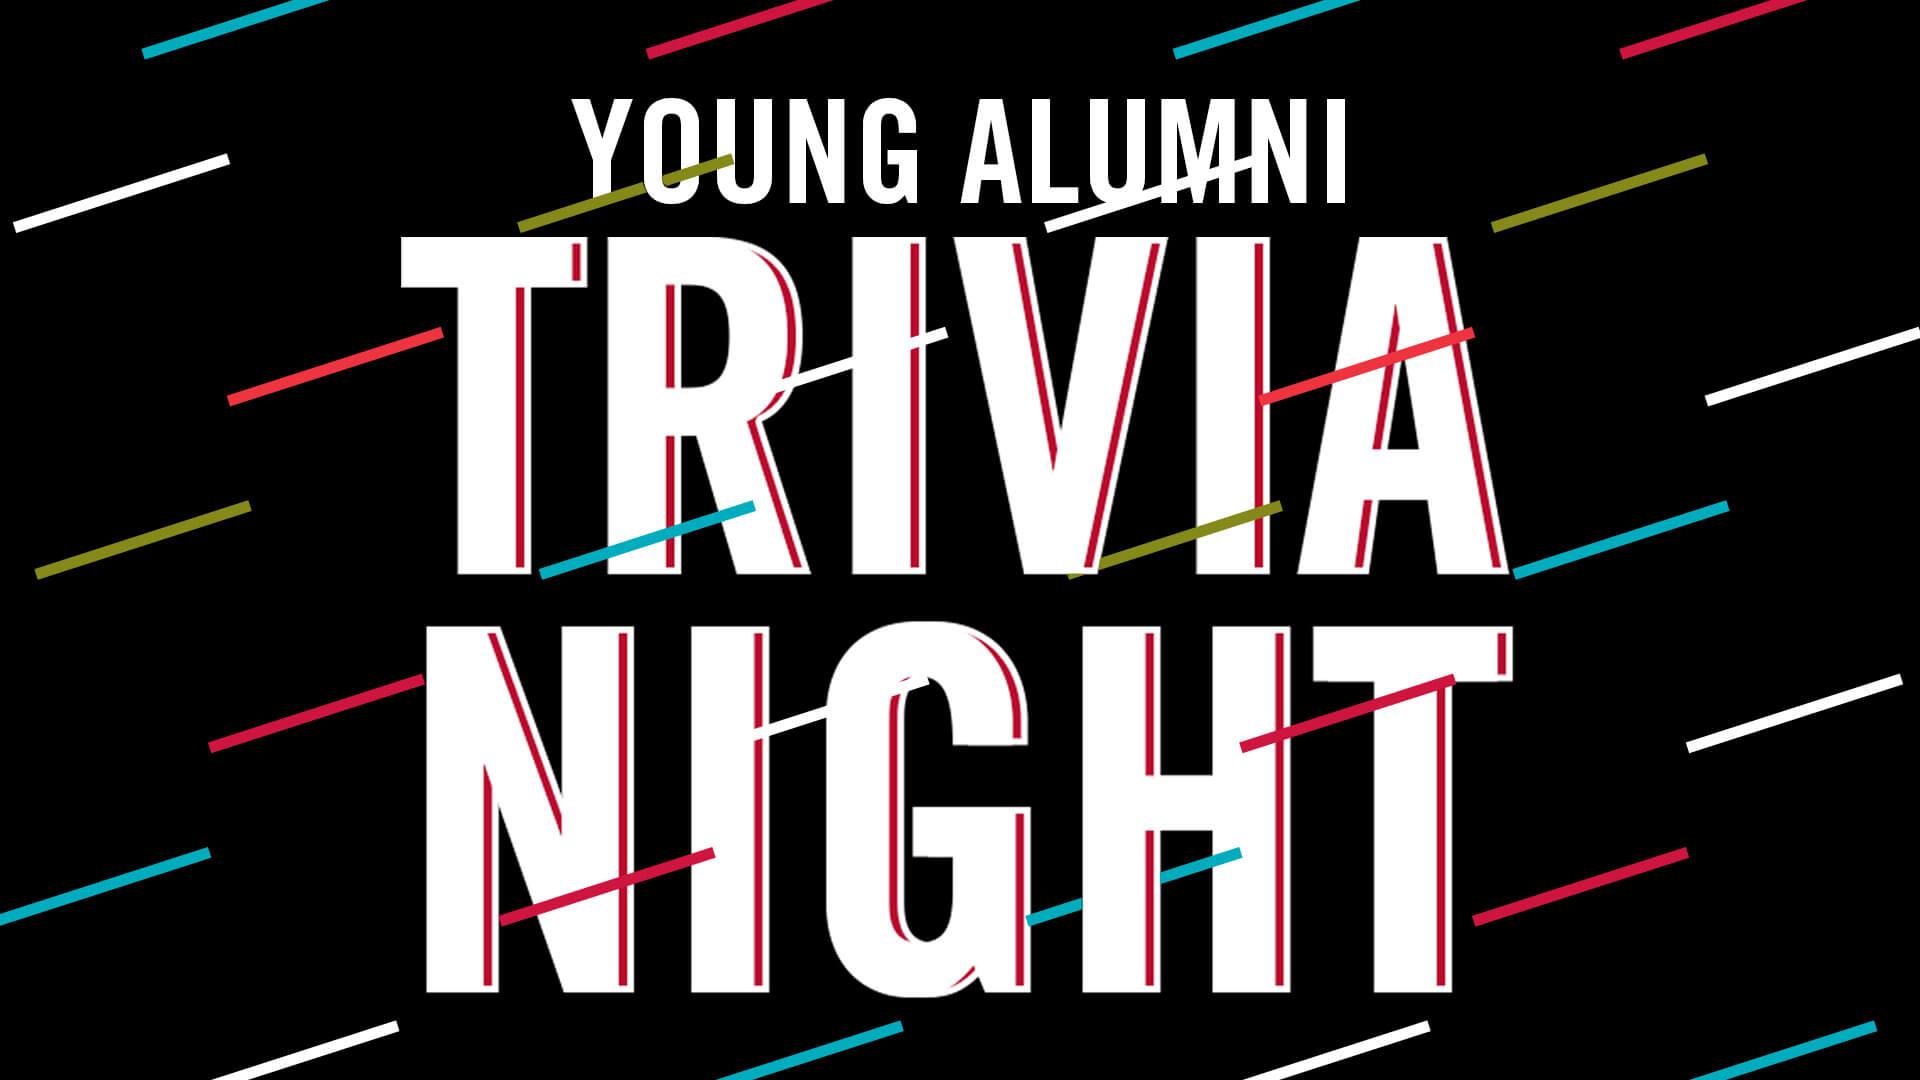 Young Alumni Trivia Night